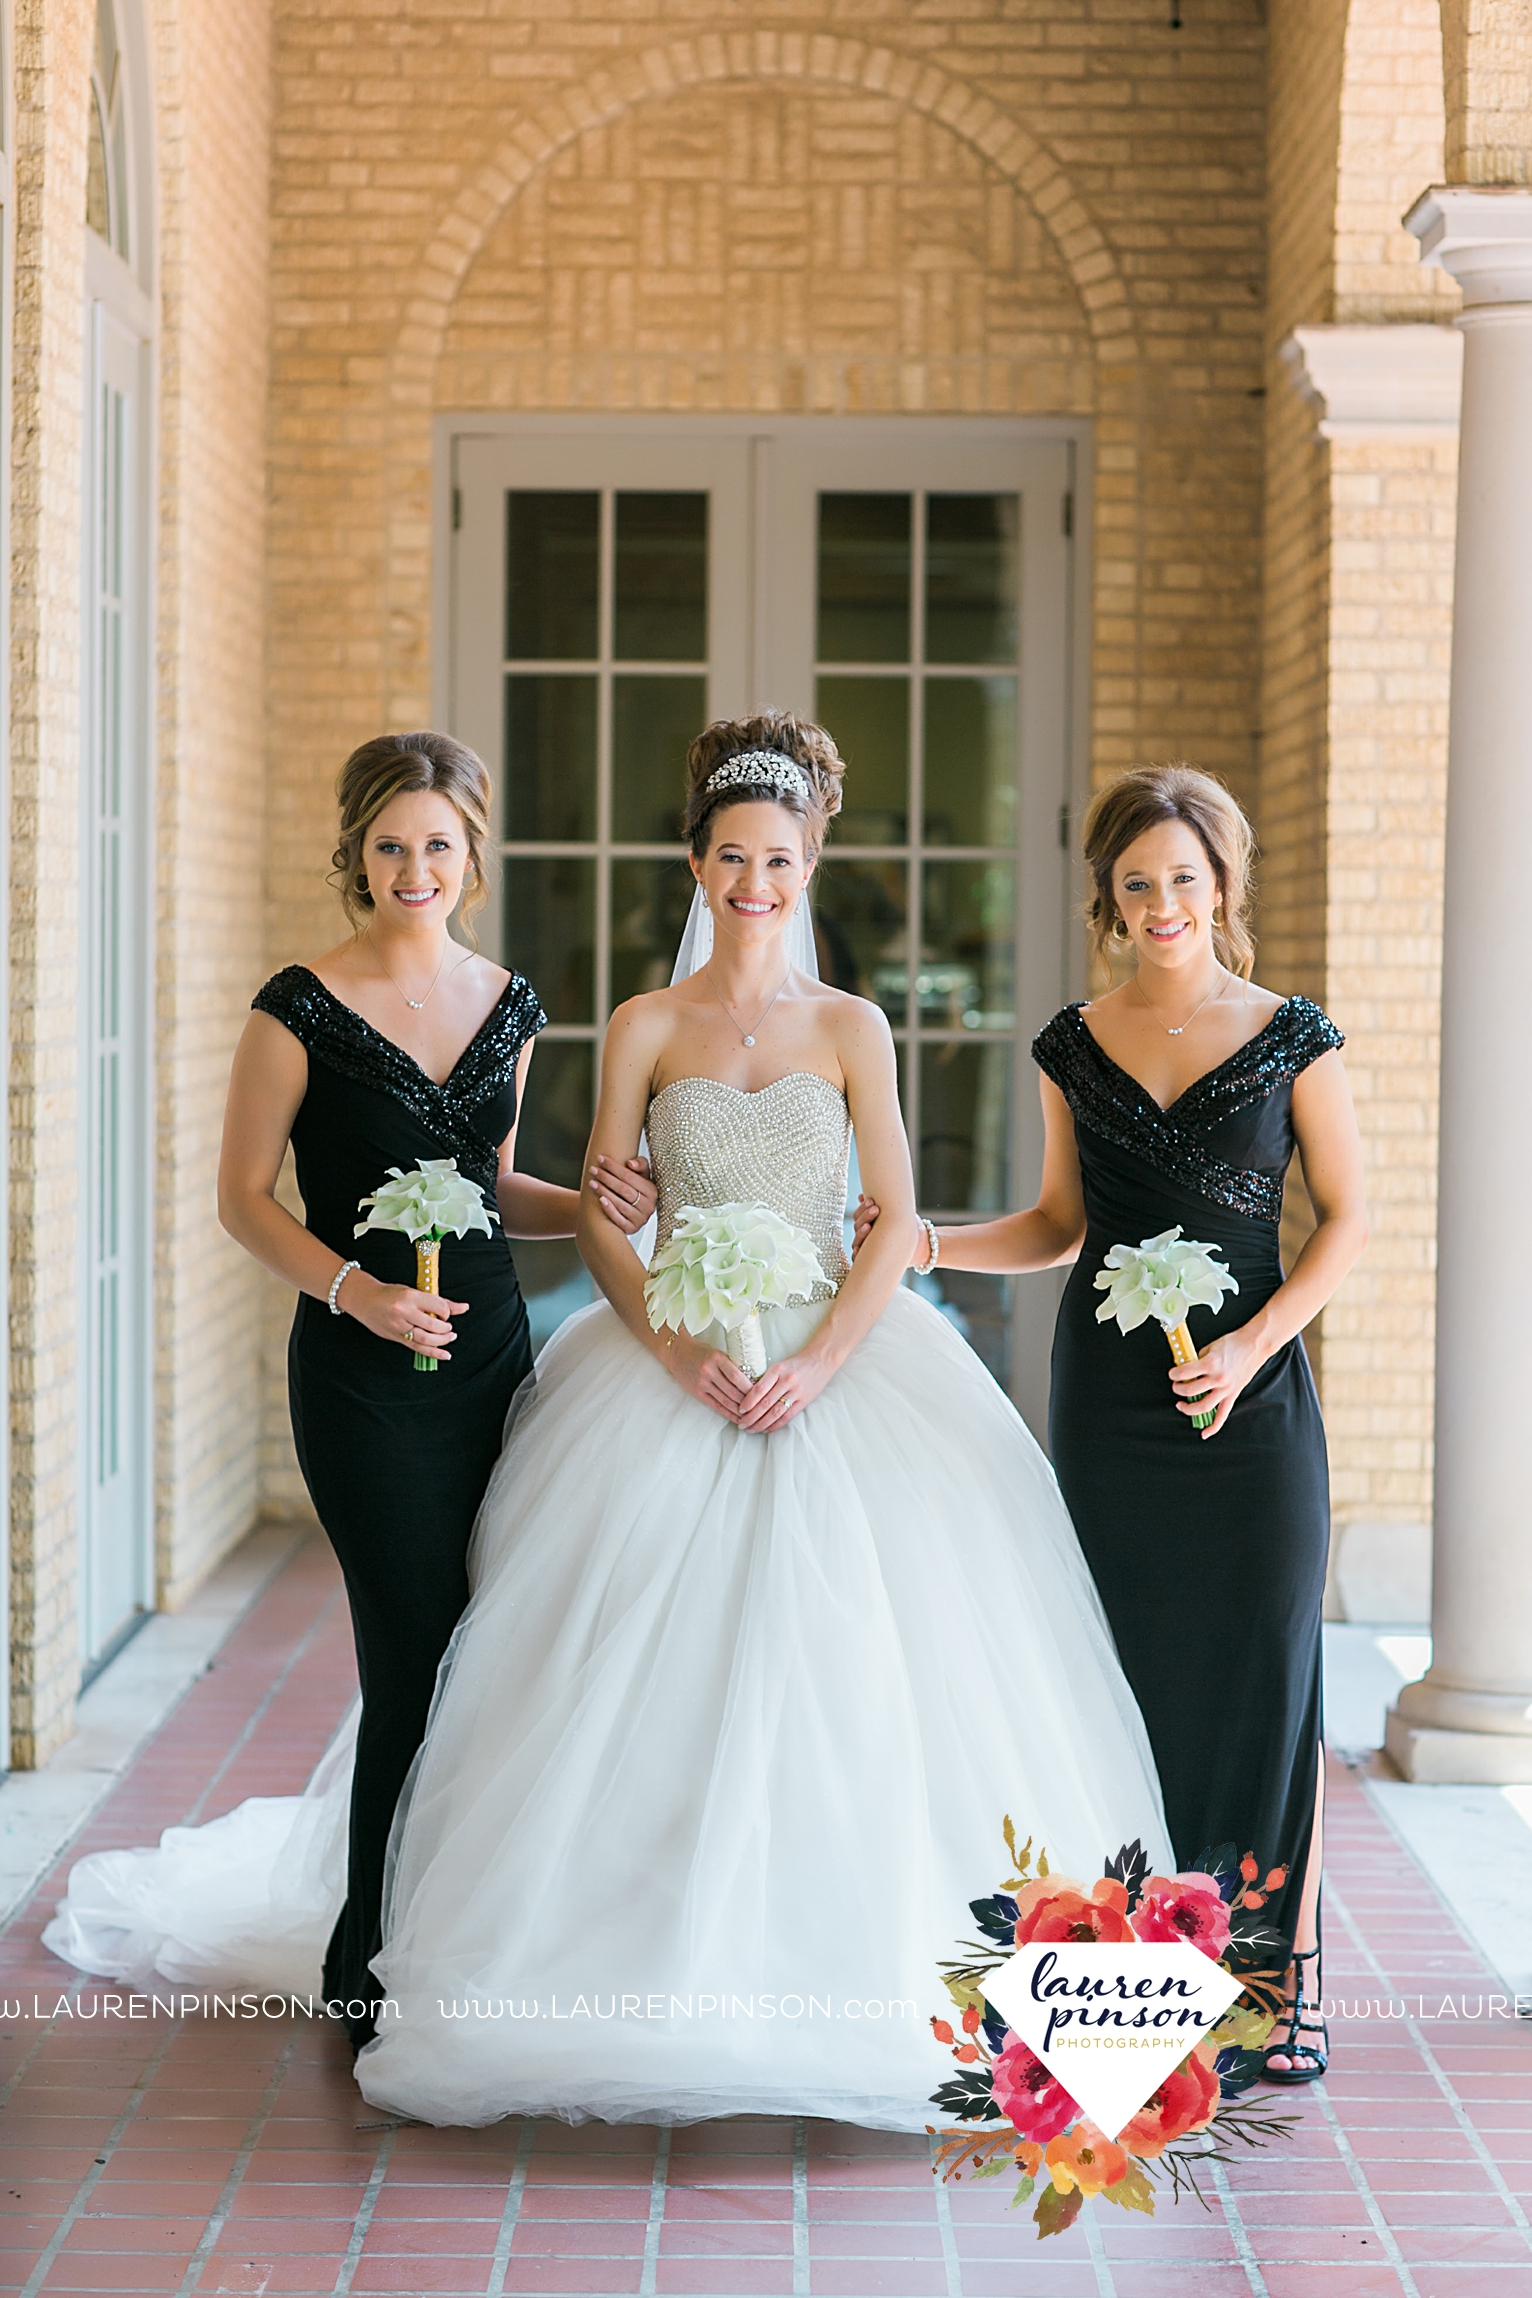 wichita-falls-texas-wedding-photographer-the-forum-by-the-kemp-mayfield-events-ulta-gold-glitter_2839.jpg